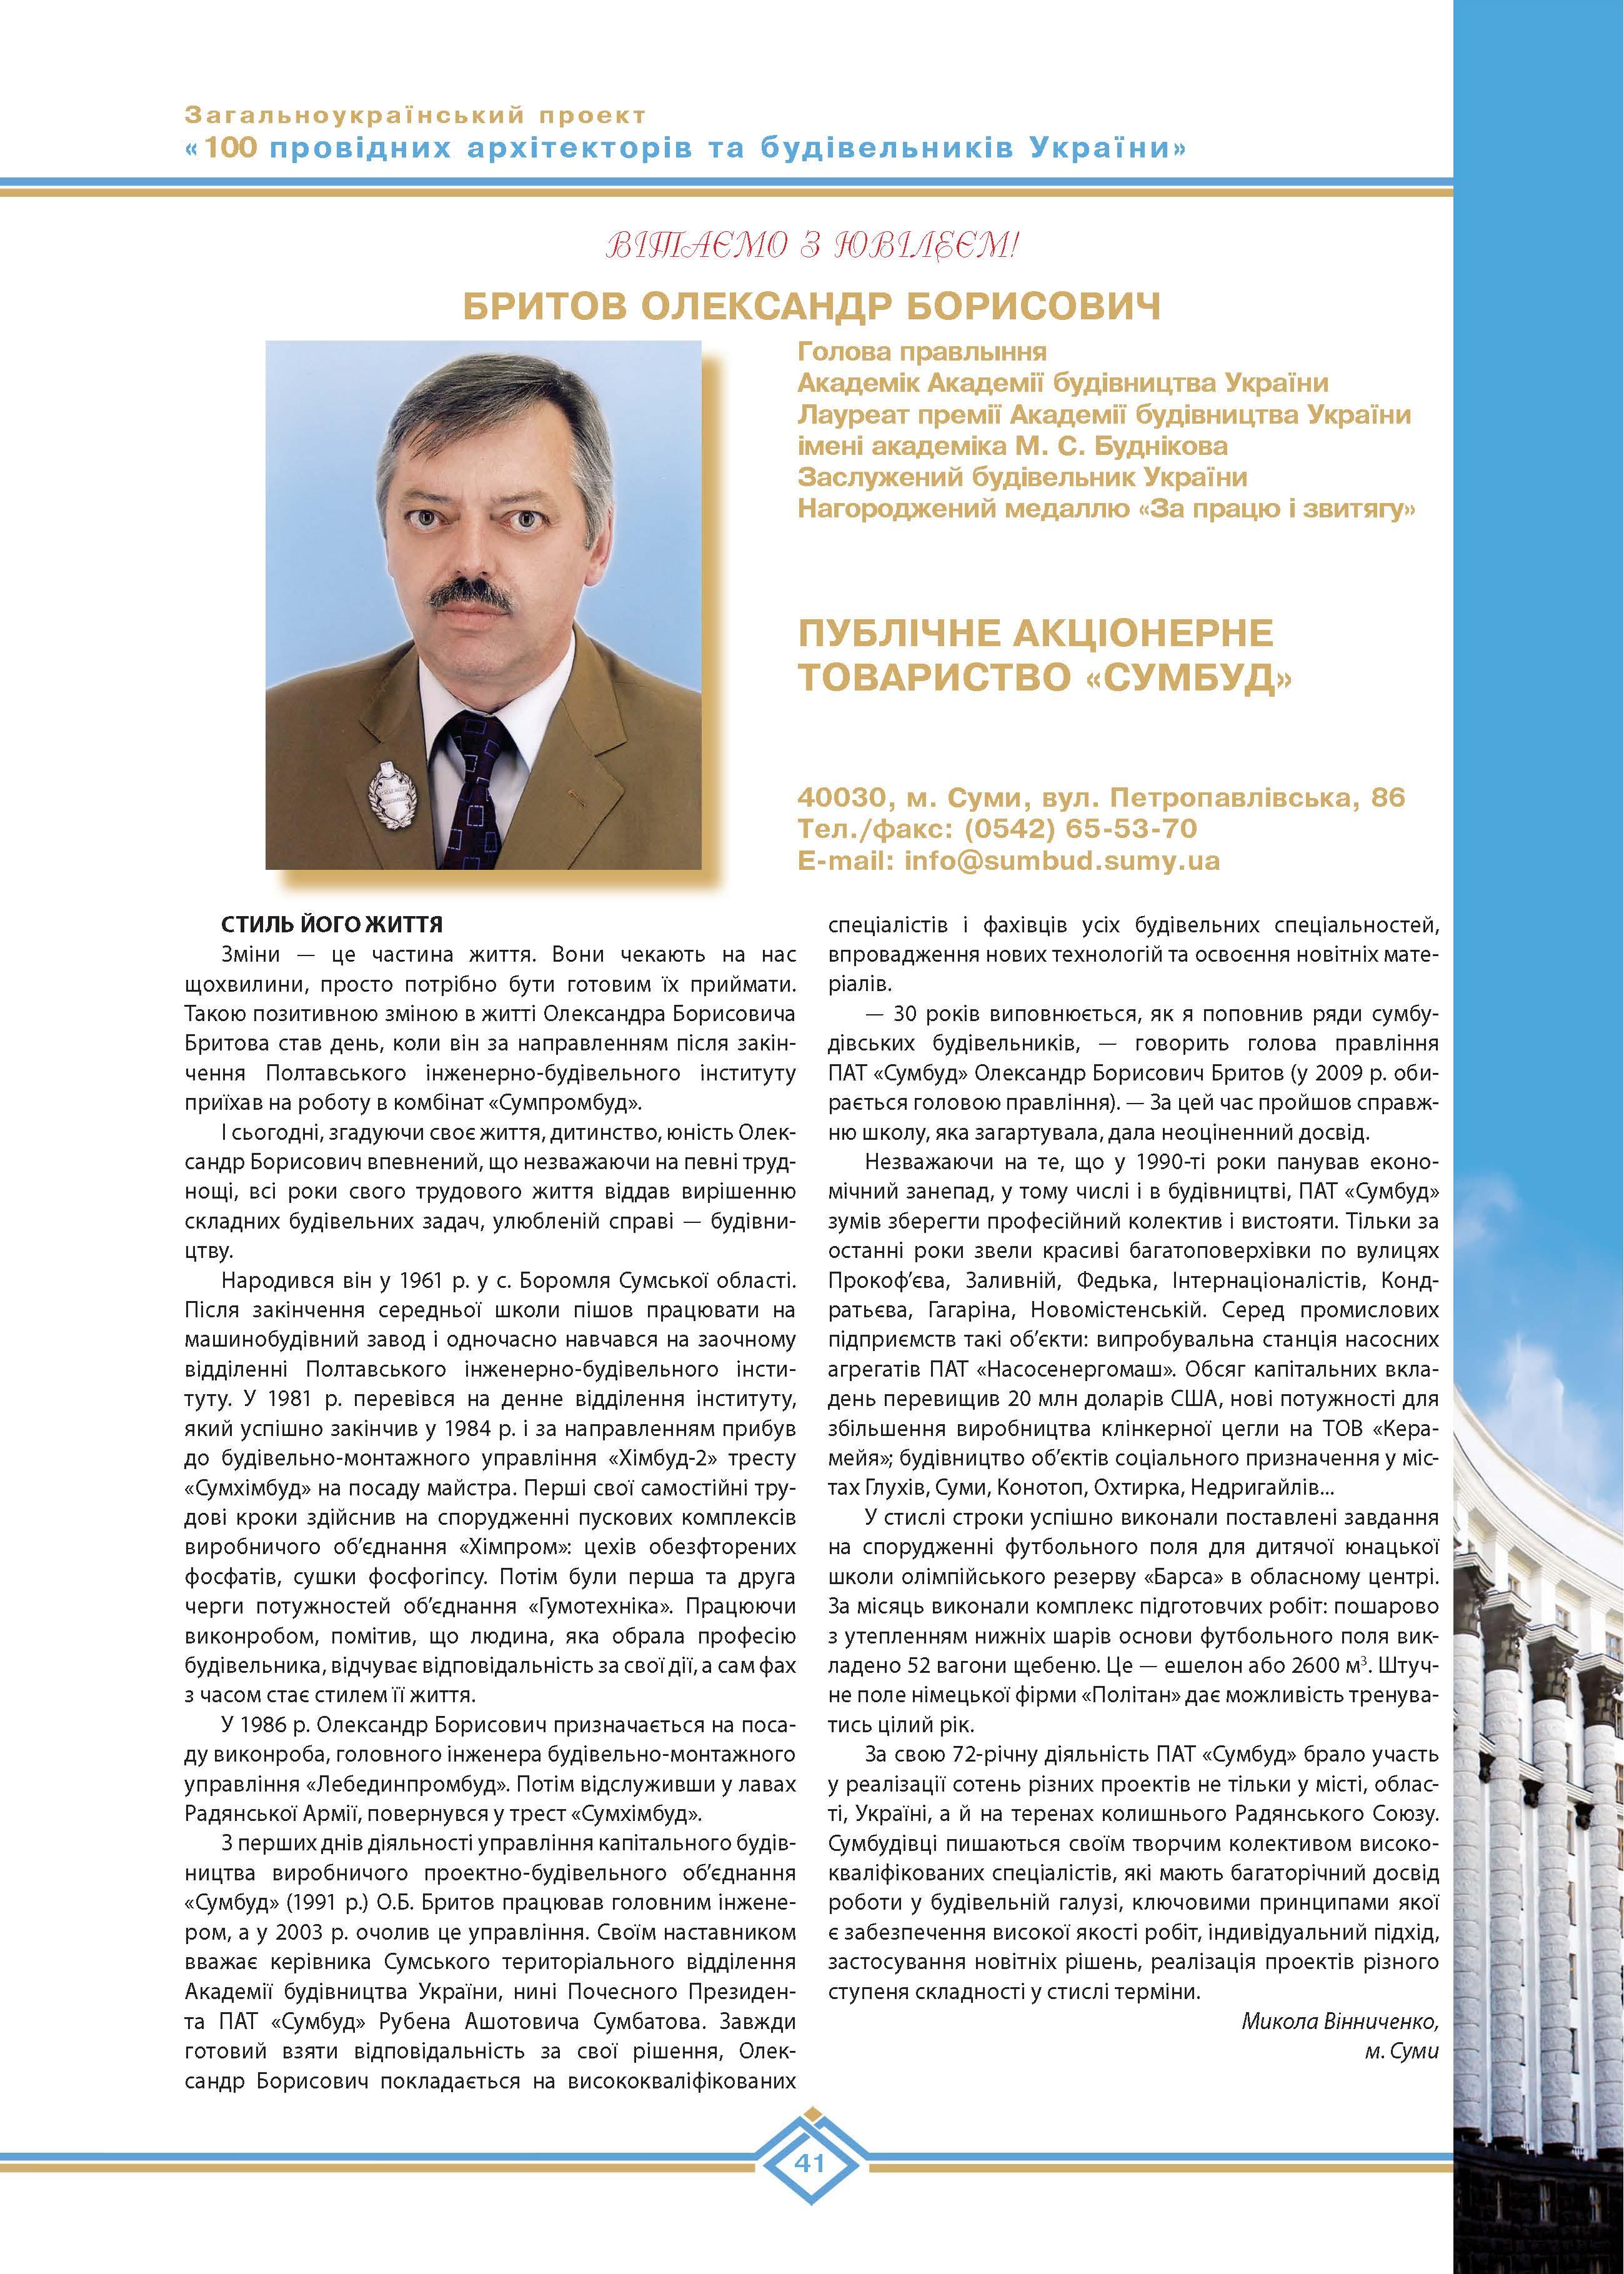 Бритов Олександр Борисович